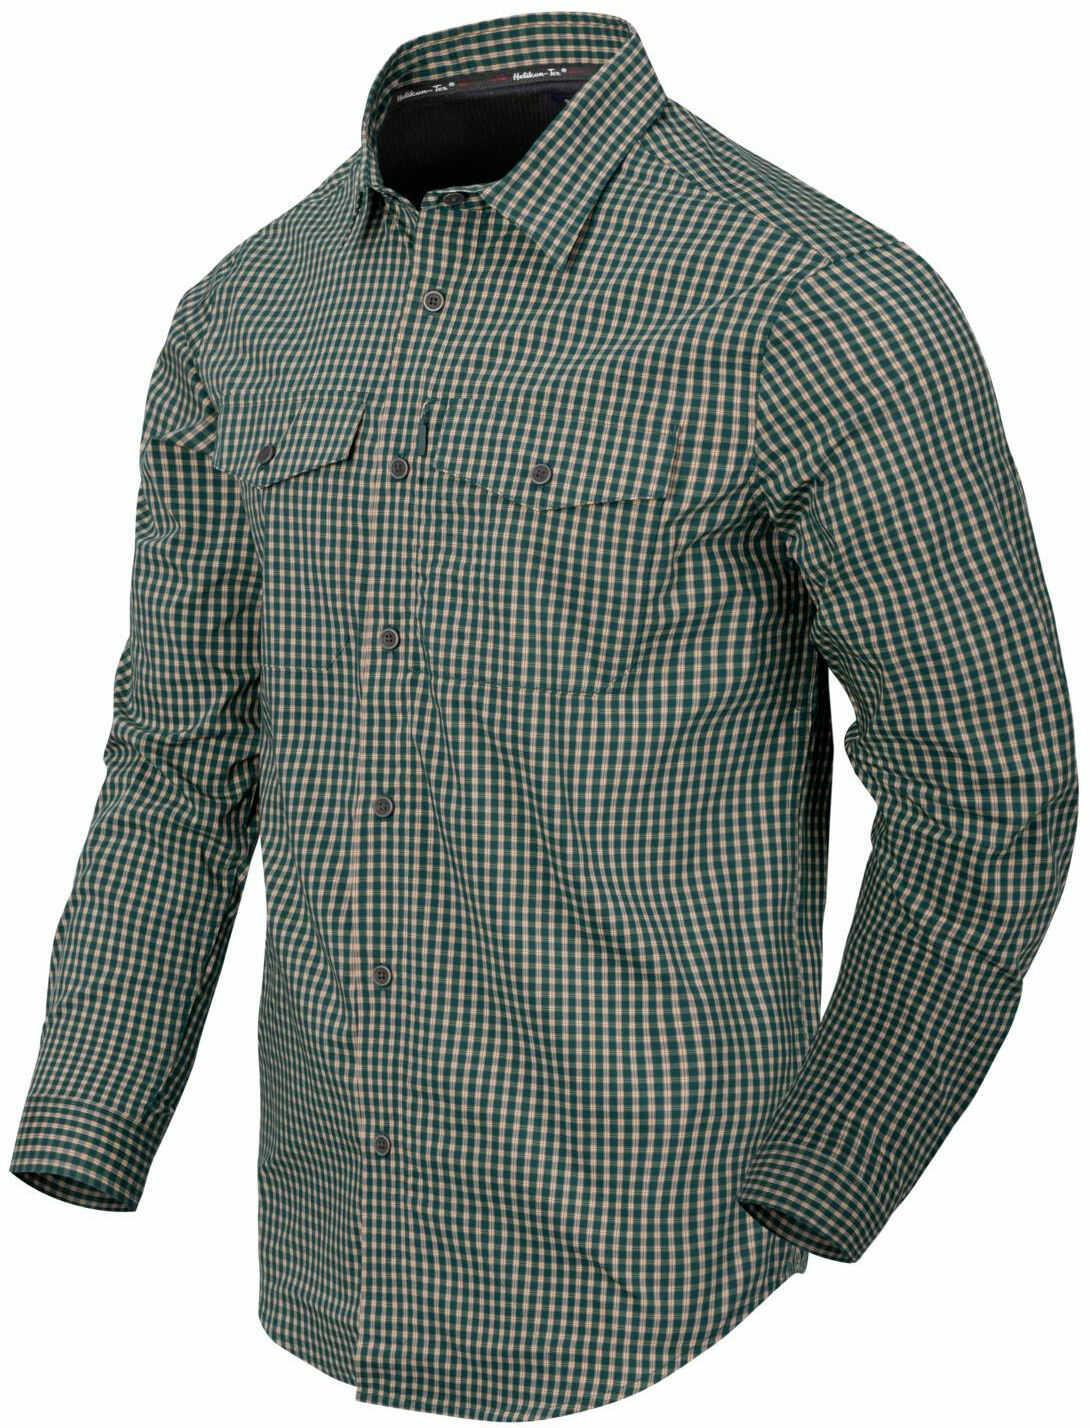 Koszula Helikon Covert Concealed Carry Savage Green Checkered (KO-CCC-CB-C1) H